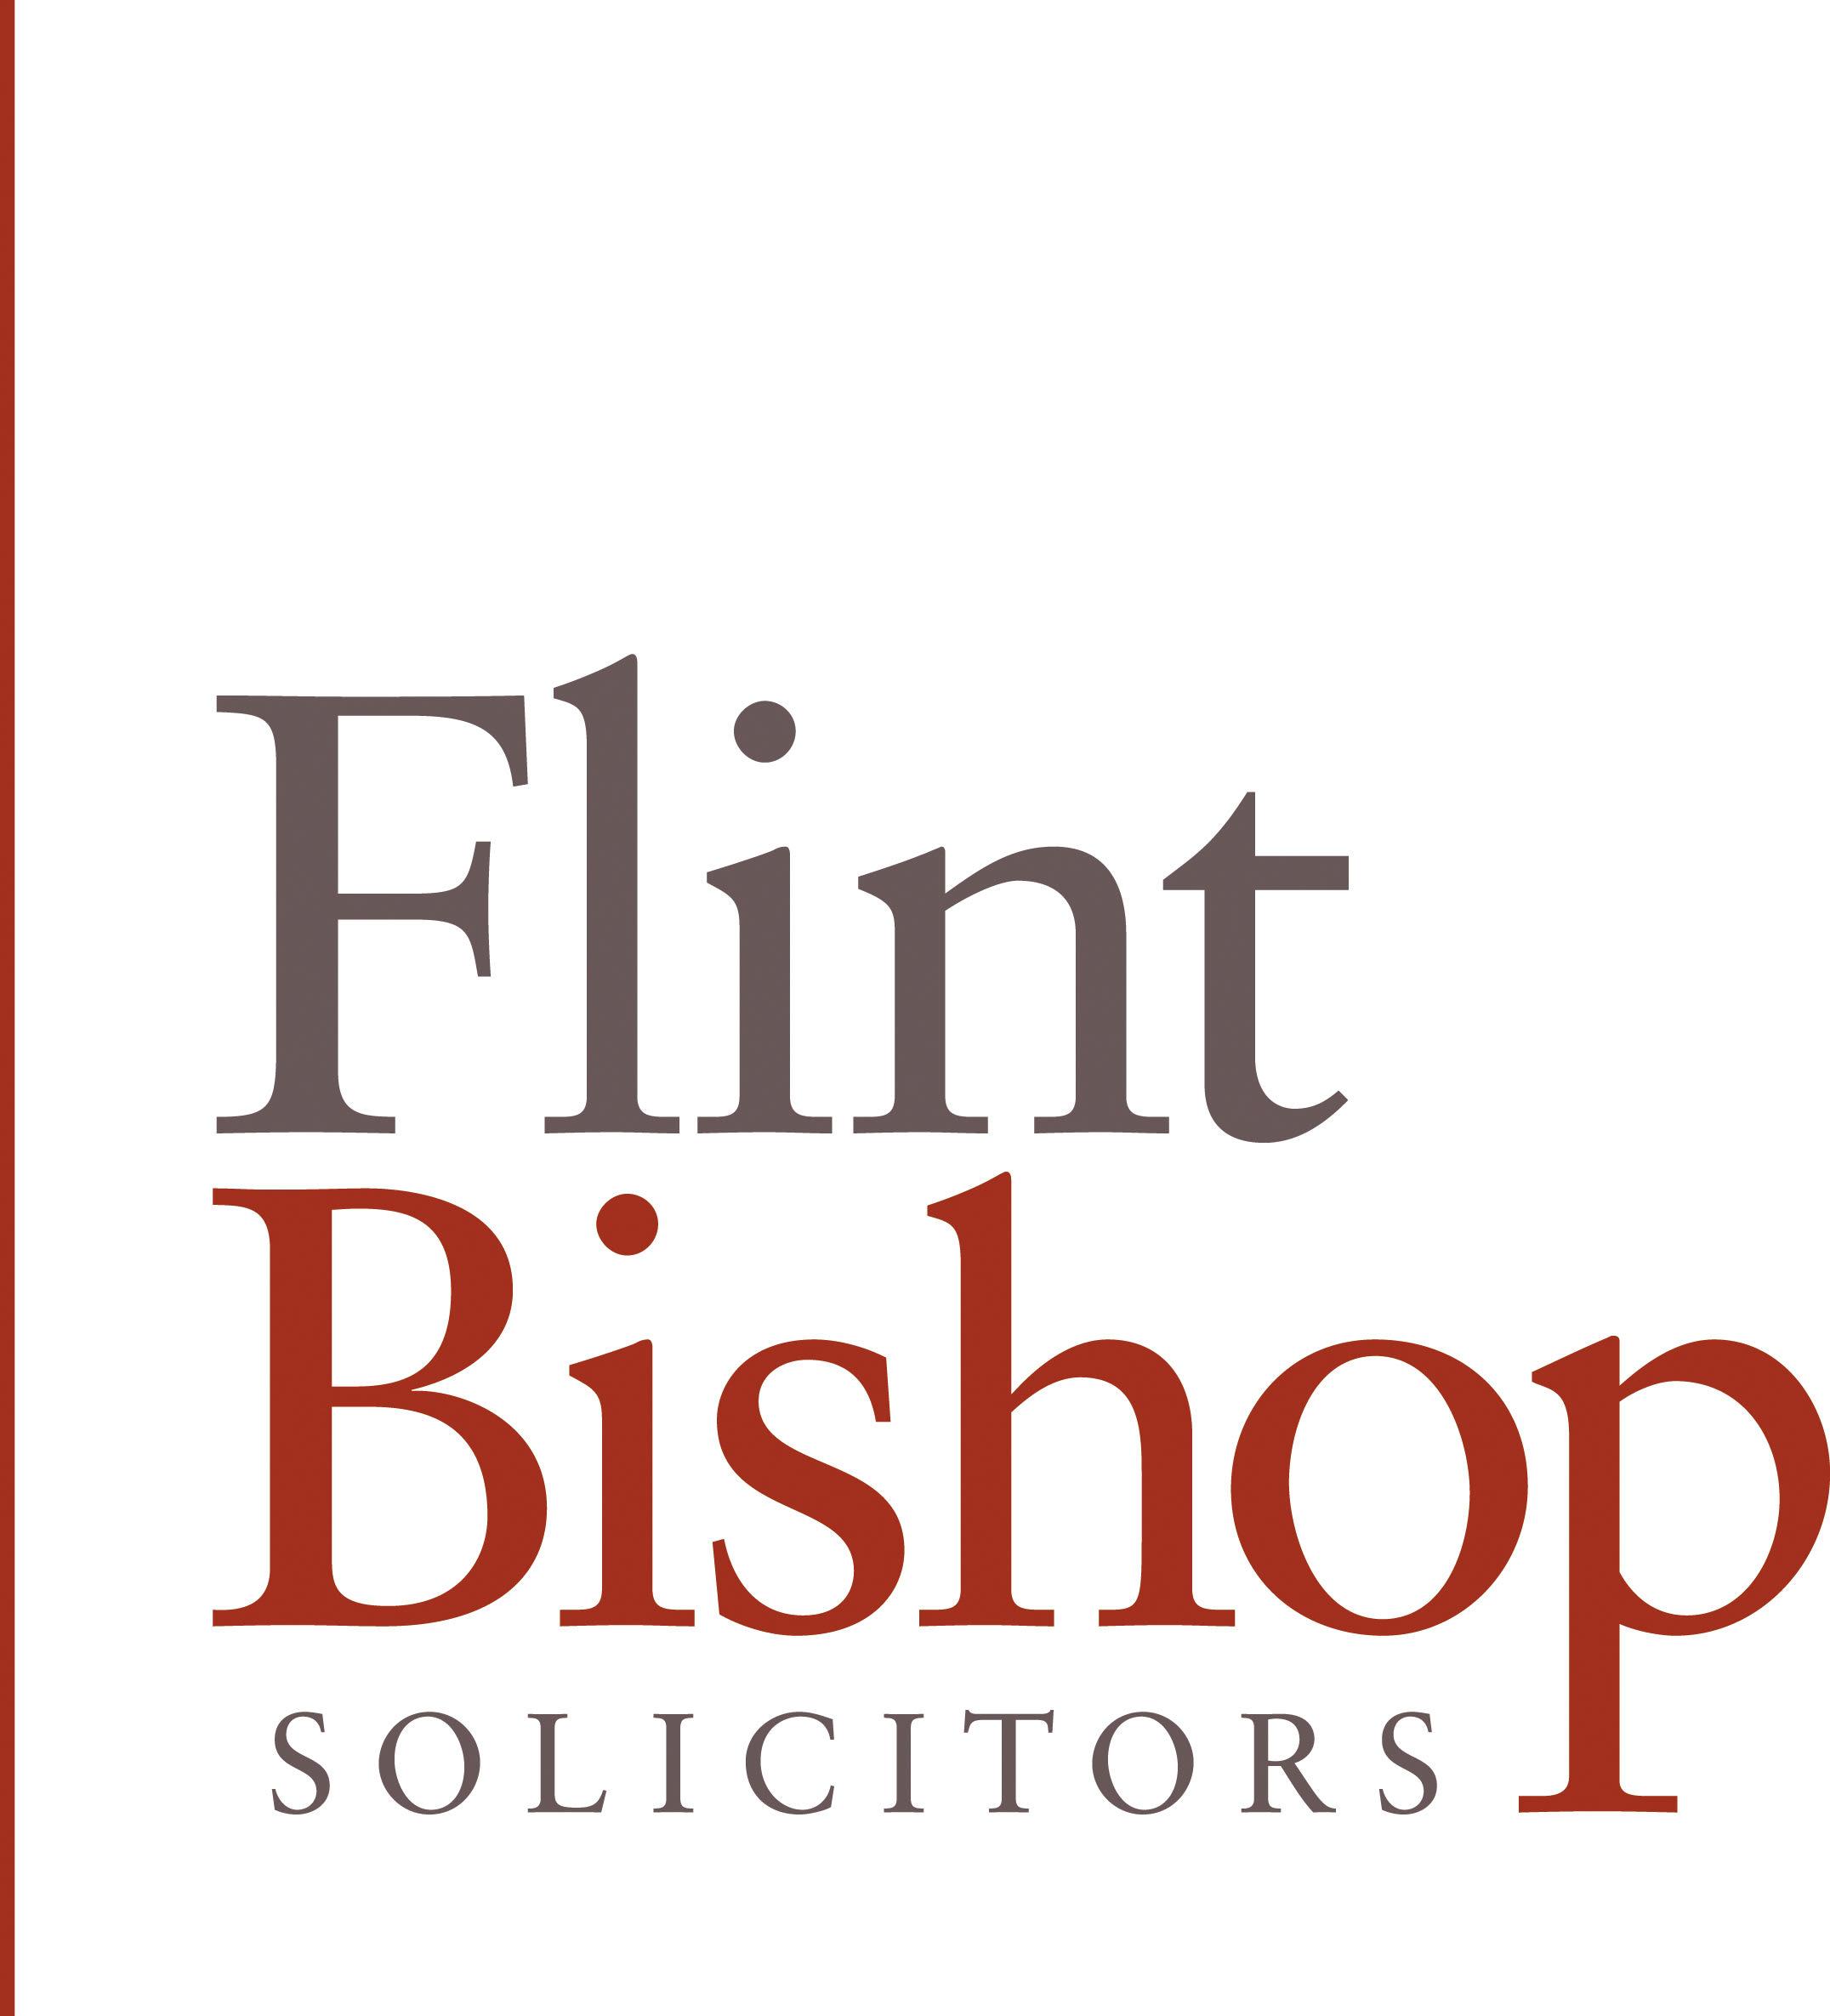 Flint Bishop social media